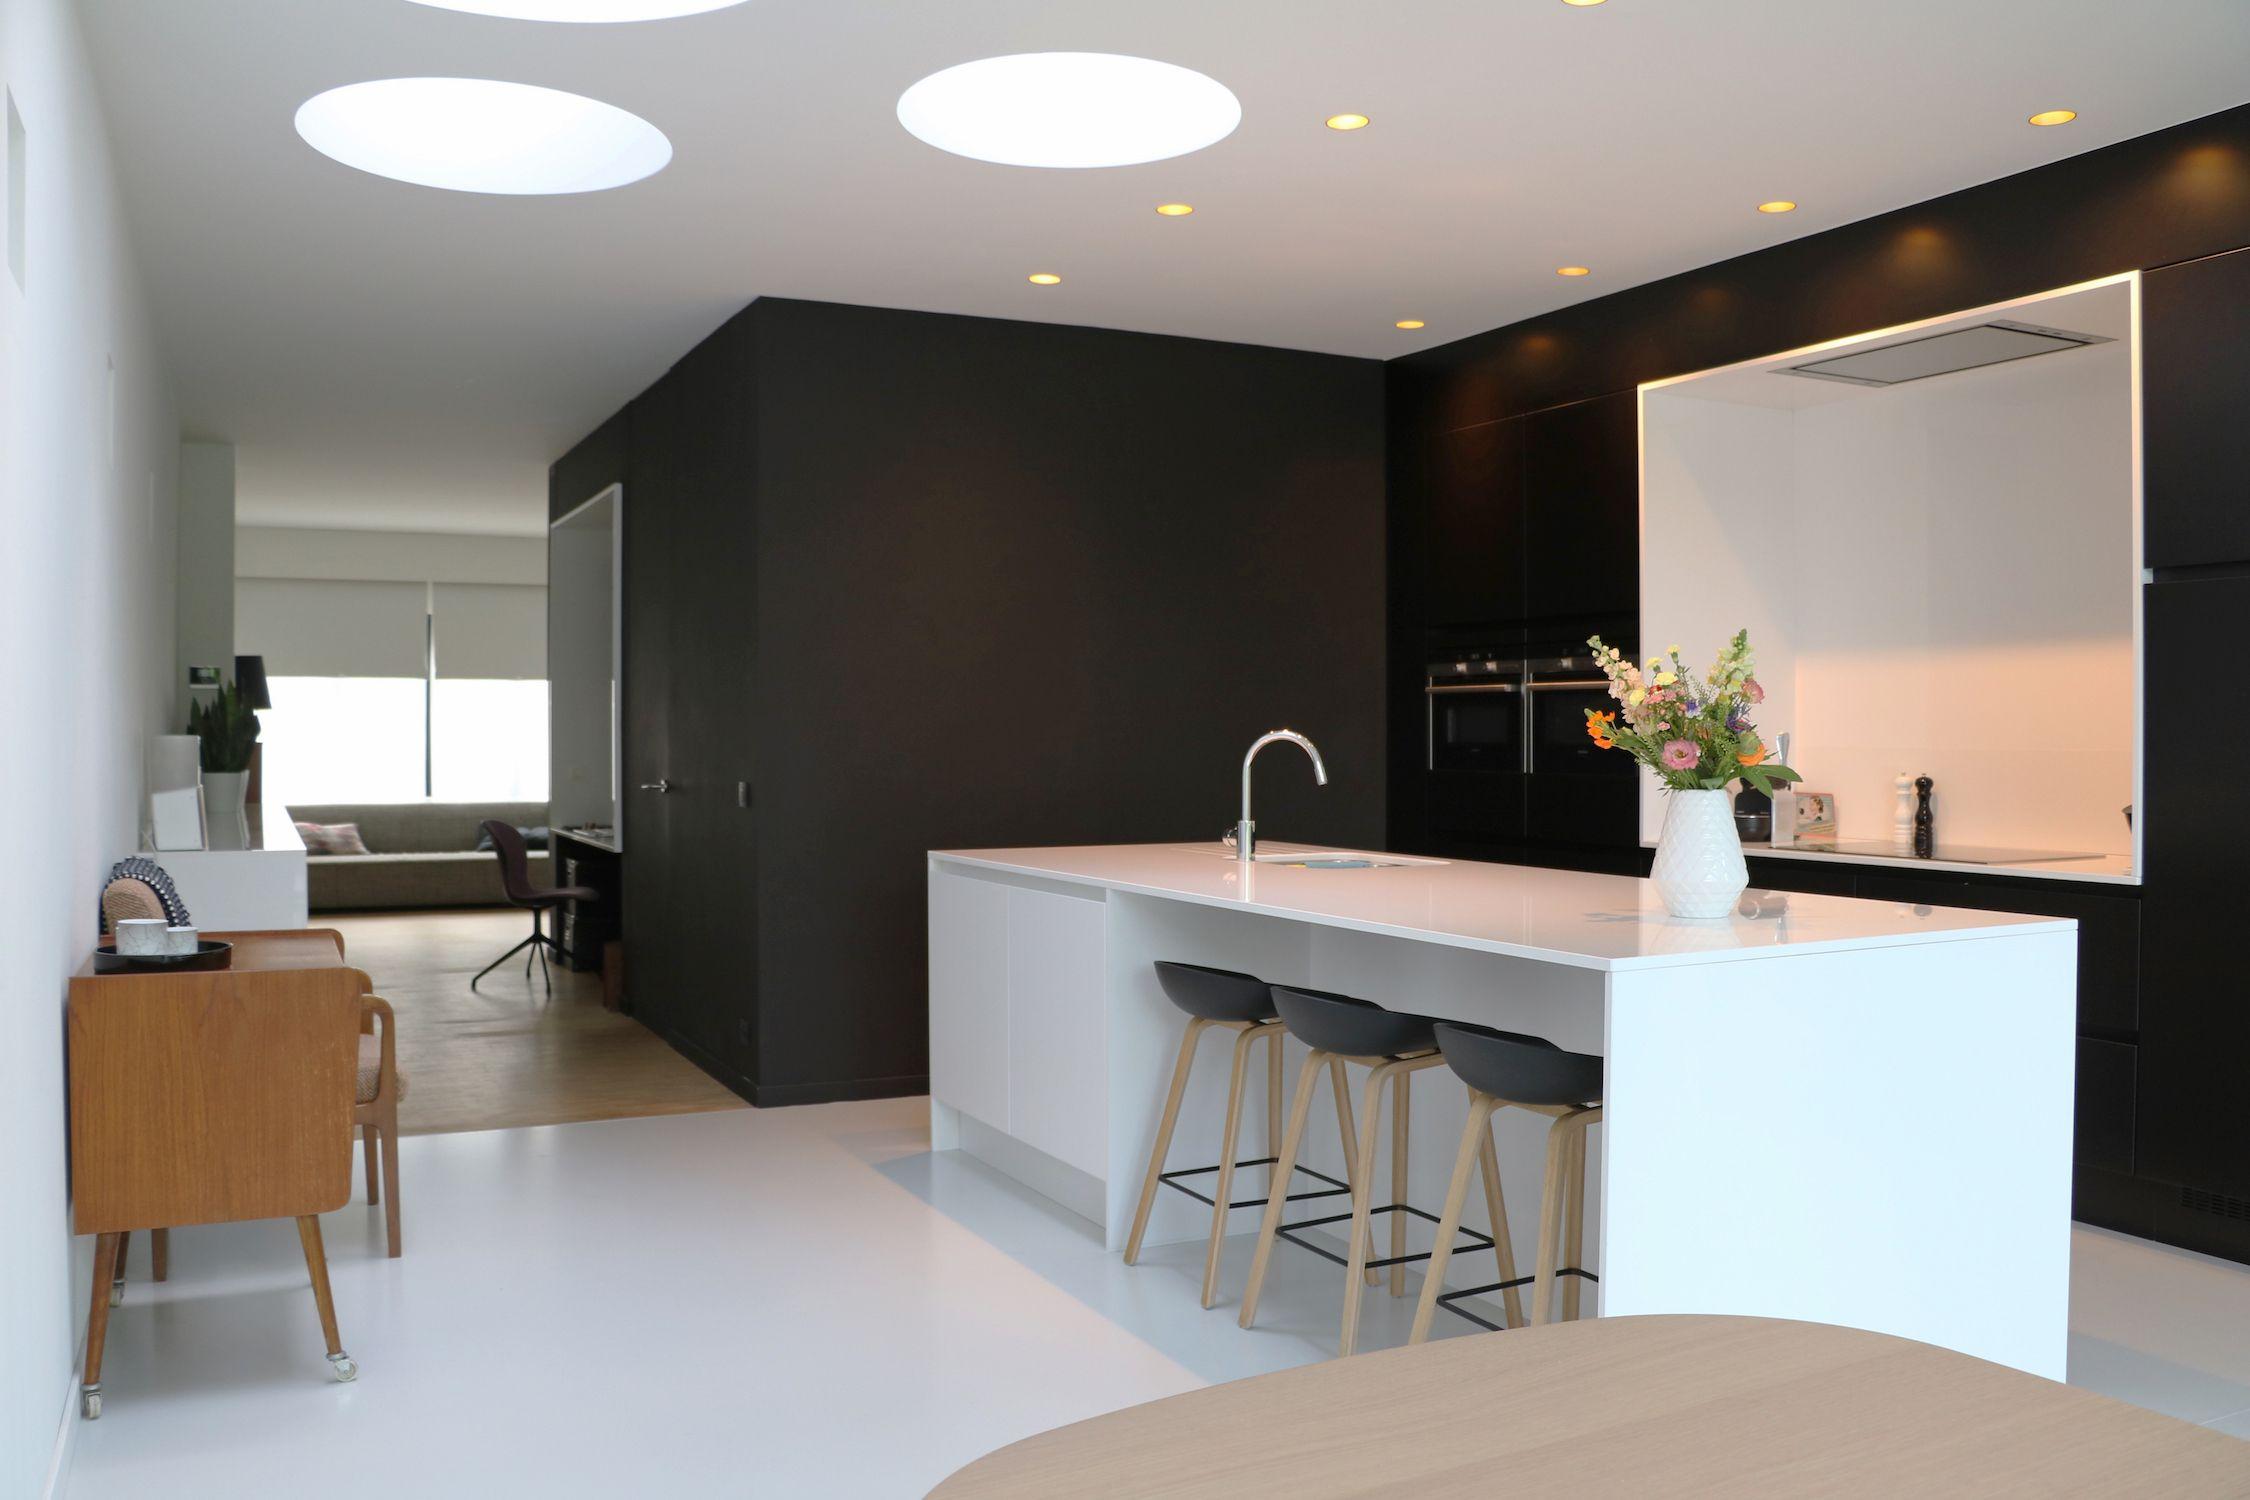 Gietvloer Kitchens Keuken : Gietvloer keuken zwart wit vintage ronde koepels hvh architecten